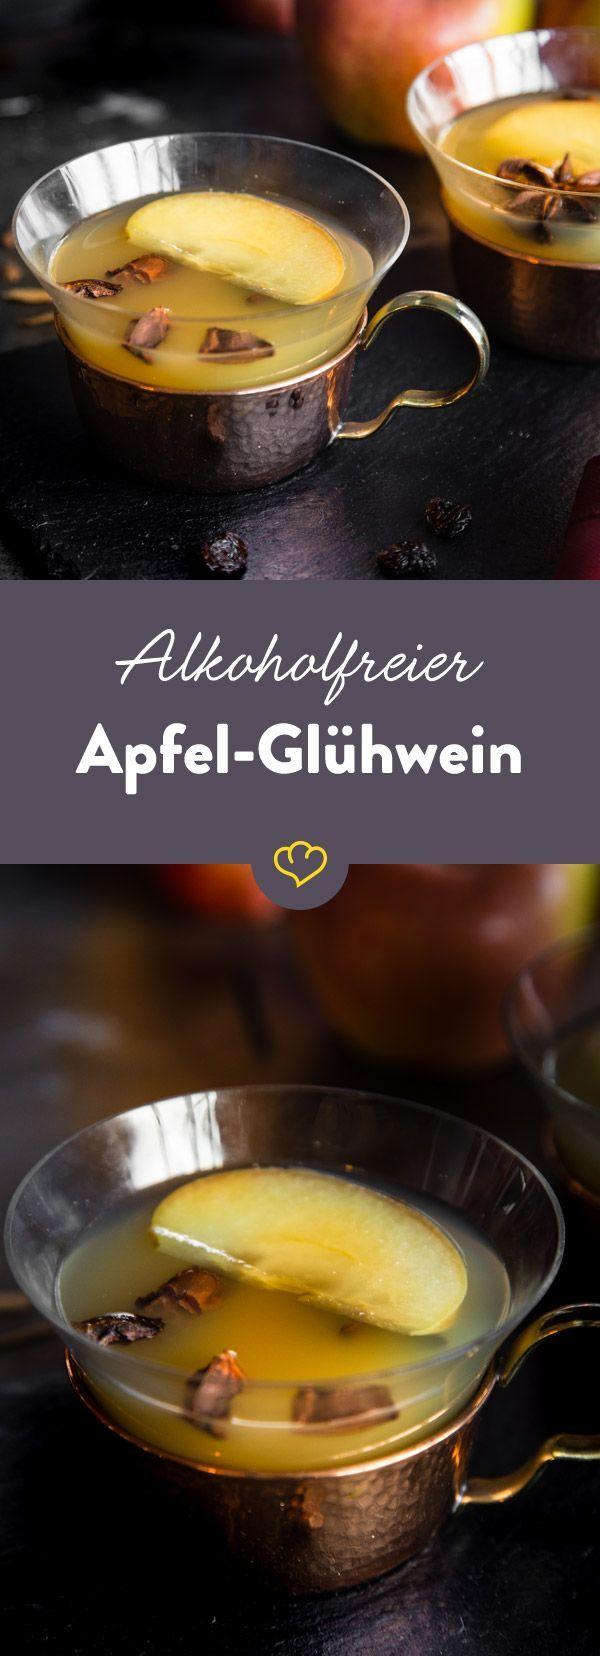 Die alkoholfreie Alternative: Apfel-Glühwein – Caitlin Gray